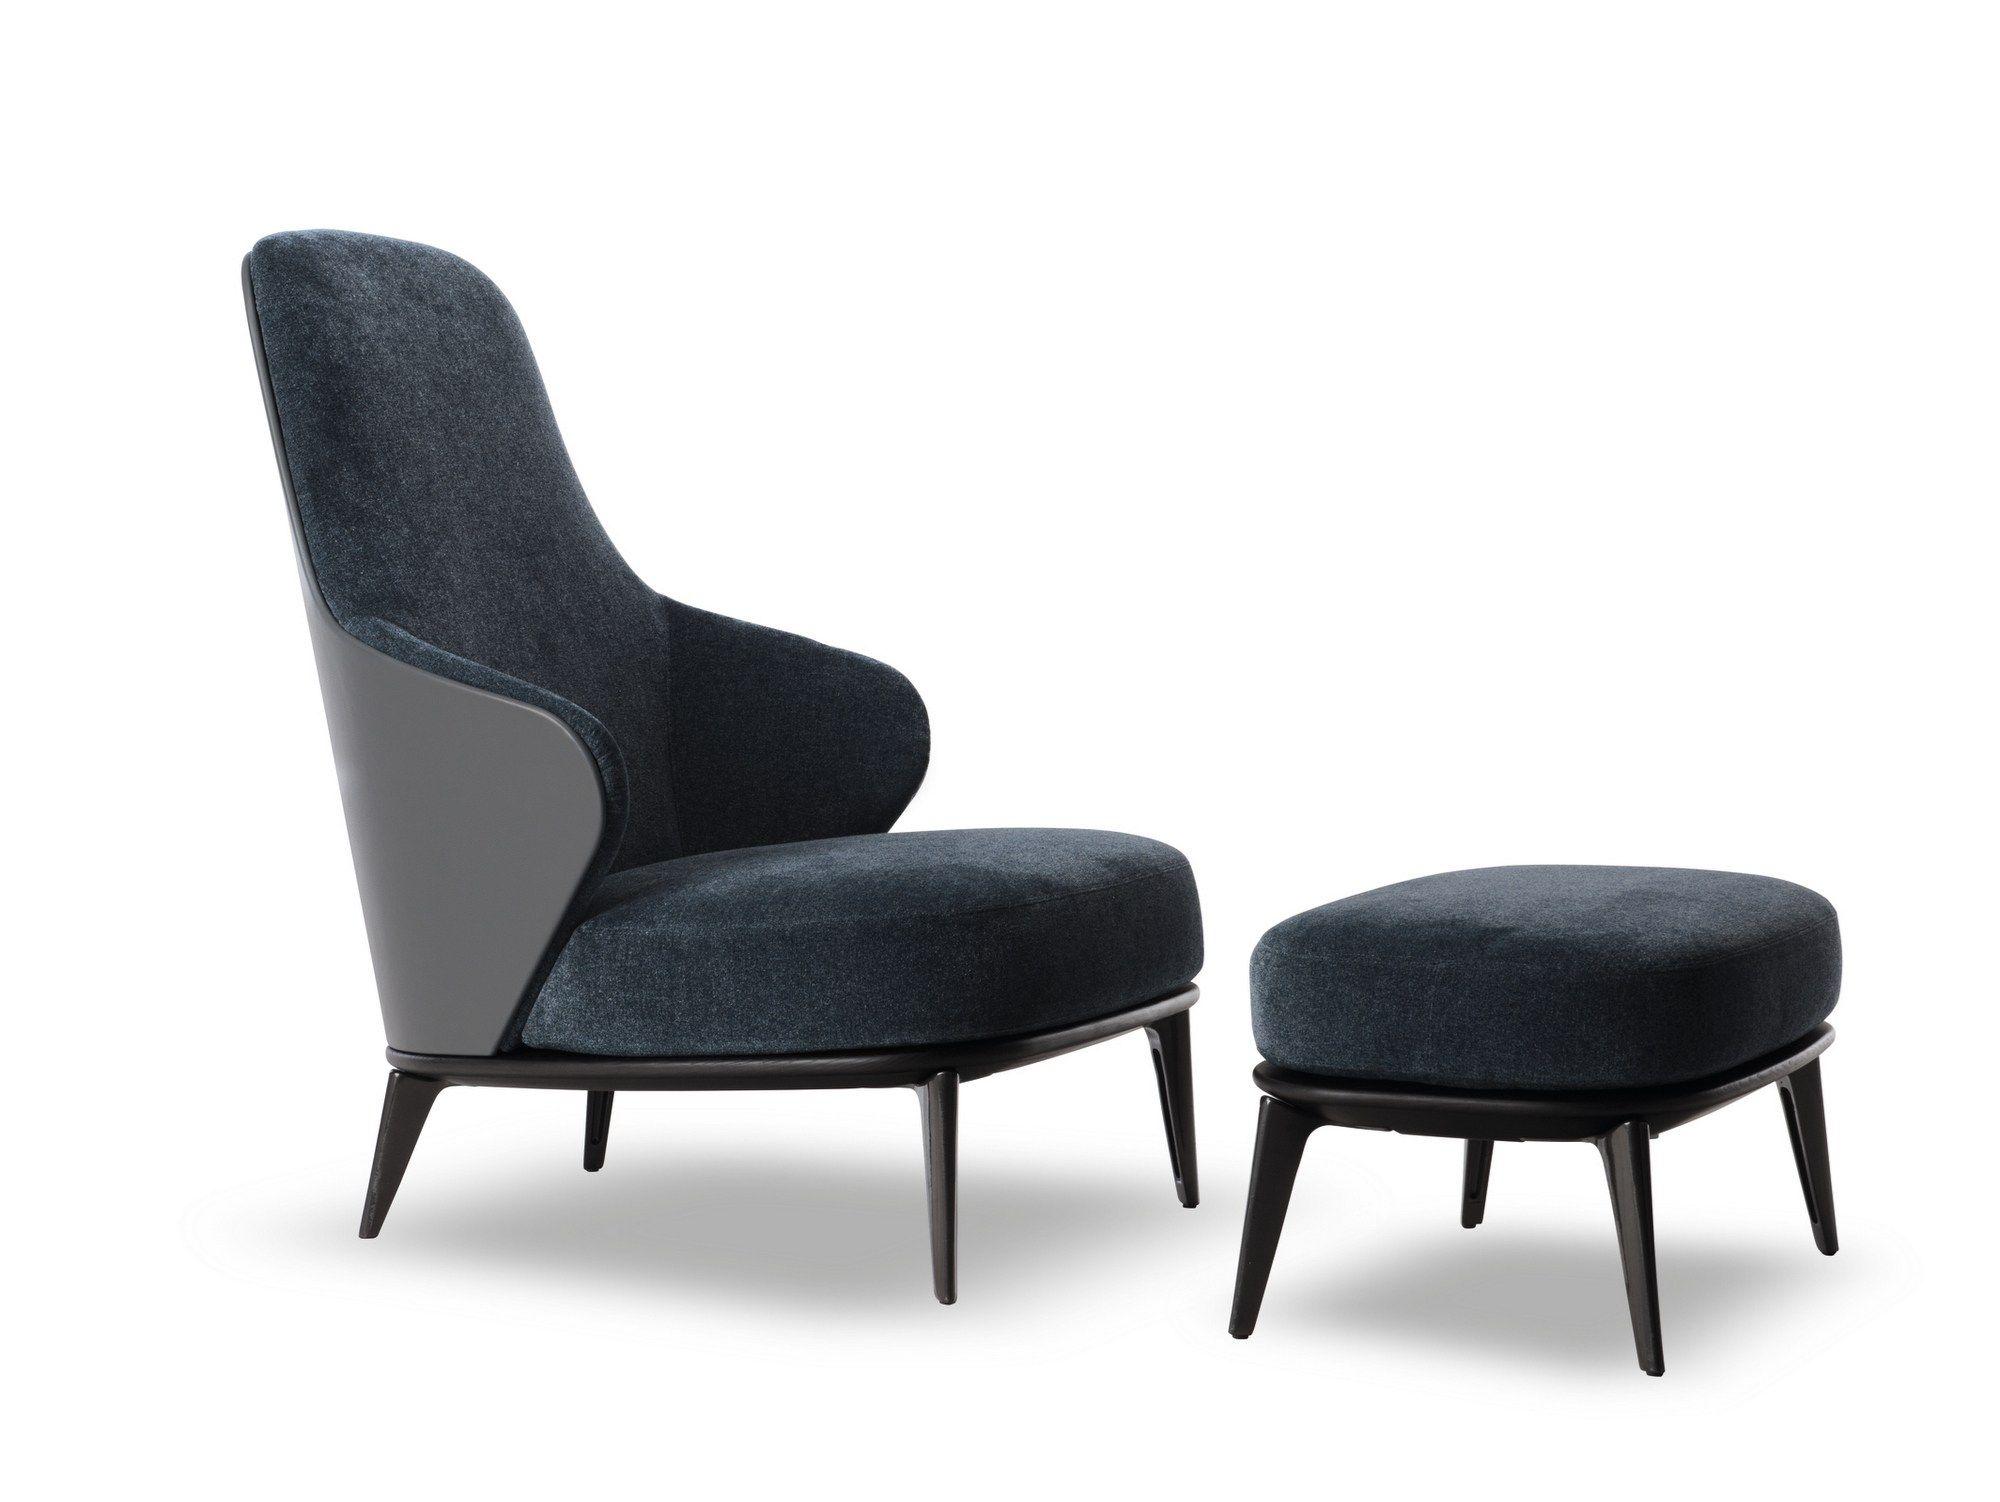 LESLIE ARMCHAIRS by Minotti design Rodolfo Dordoni